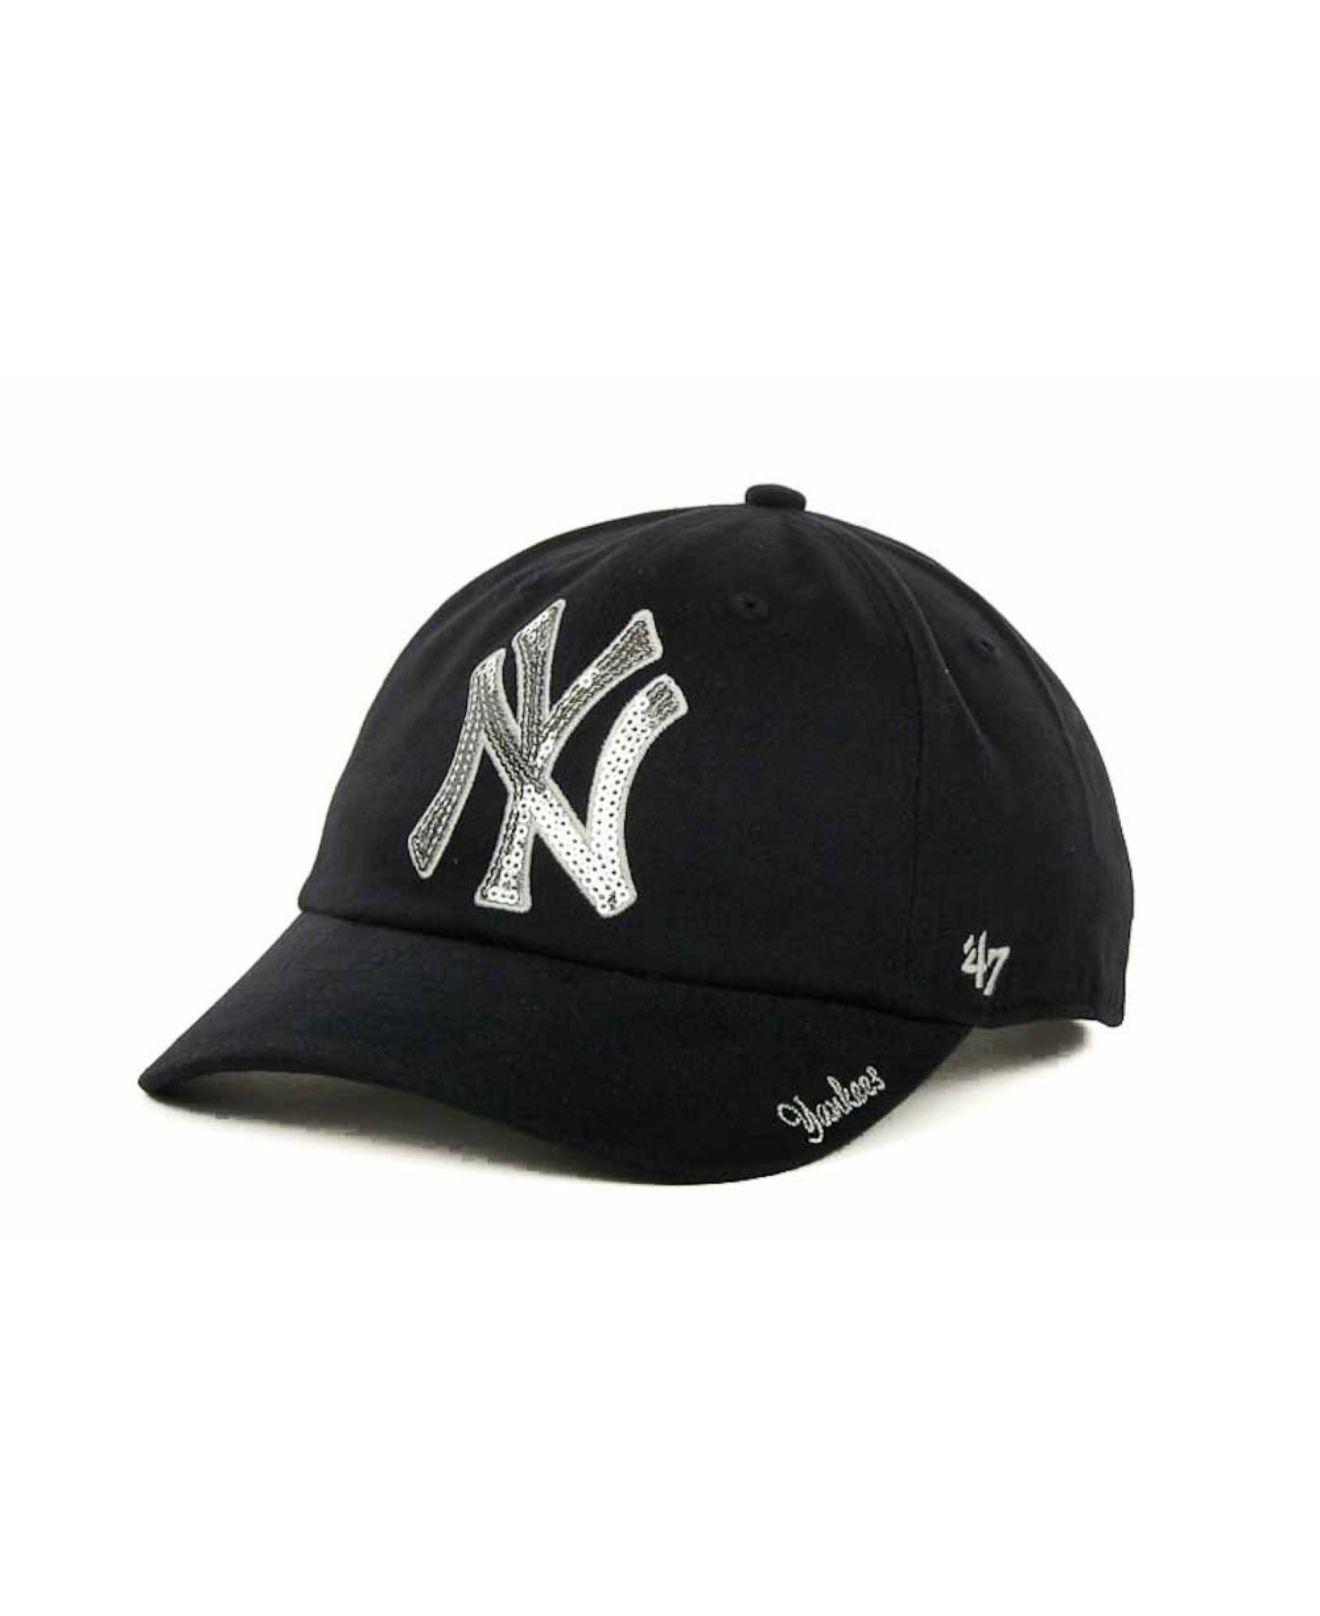 25c34cfdd54 Lyst - 47 Brand Women s New York Yankees Sparkle Cap in Blue